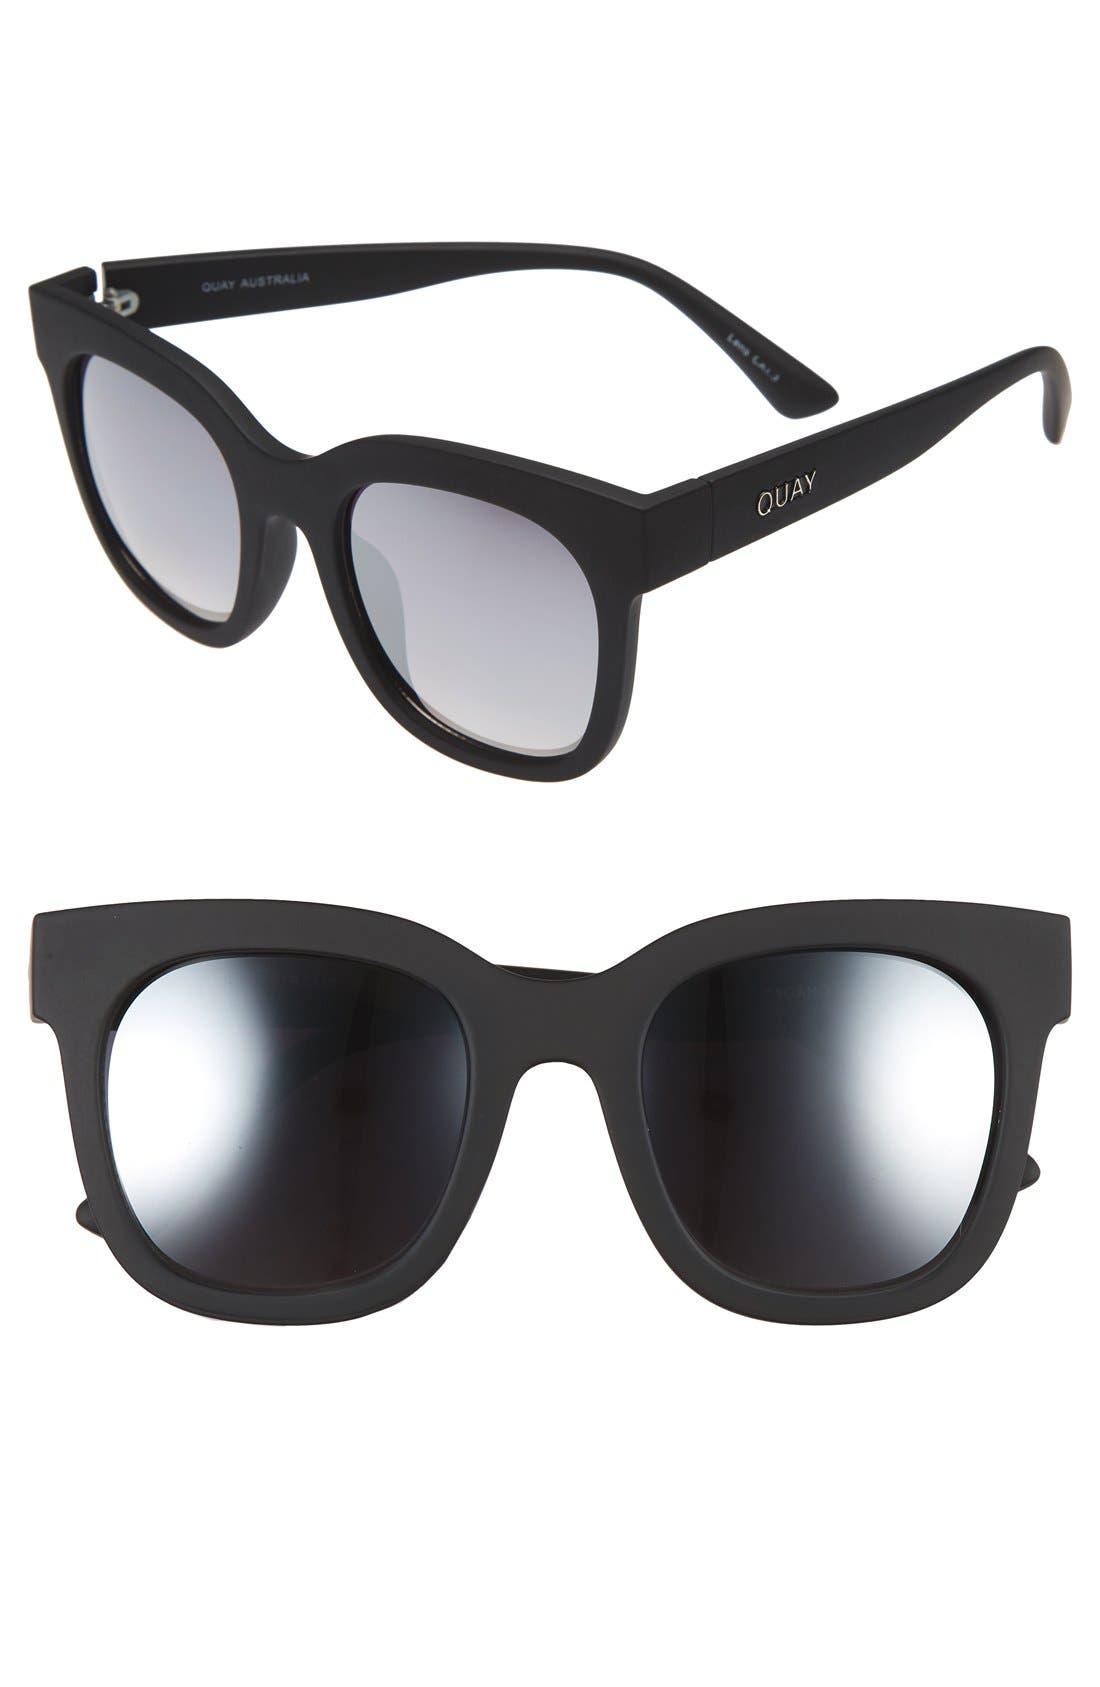 Alternate Image 1 Selected - Quay Australia 'Sagano' 50mm Square Sunglasses